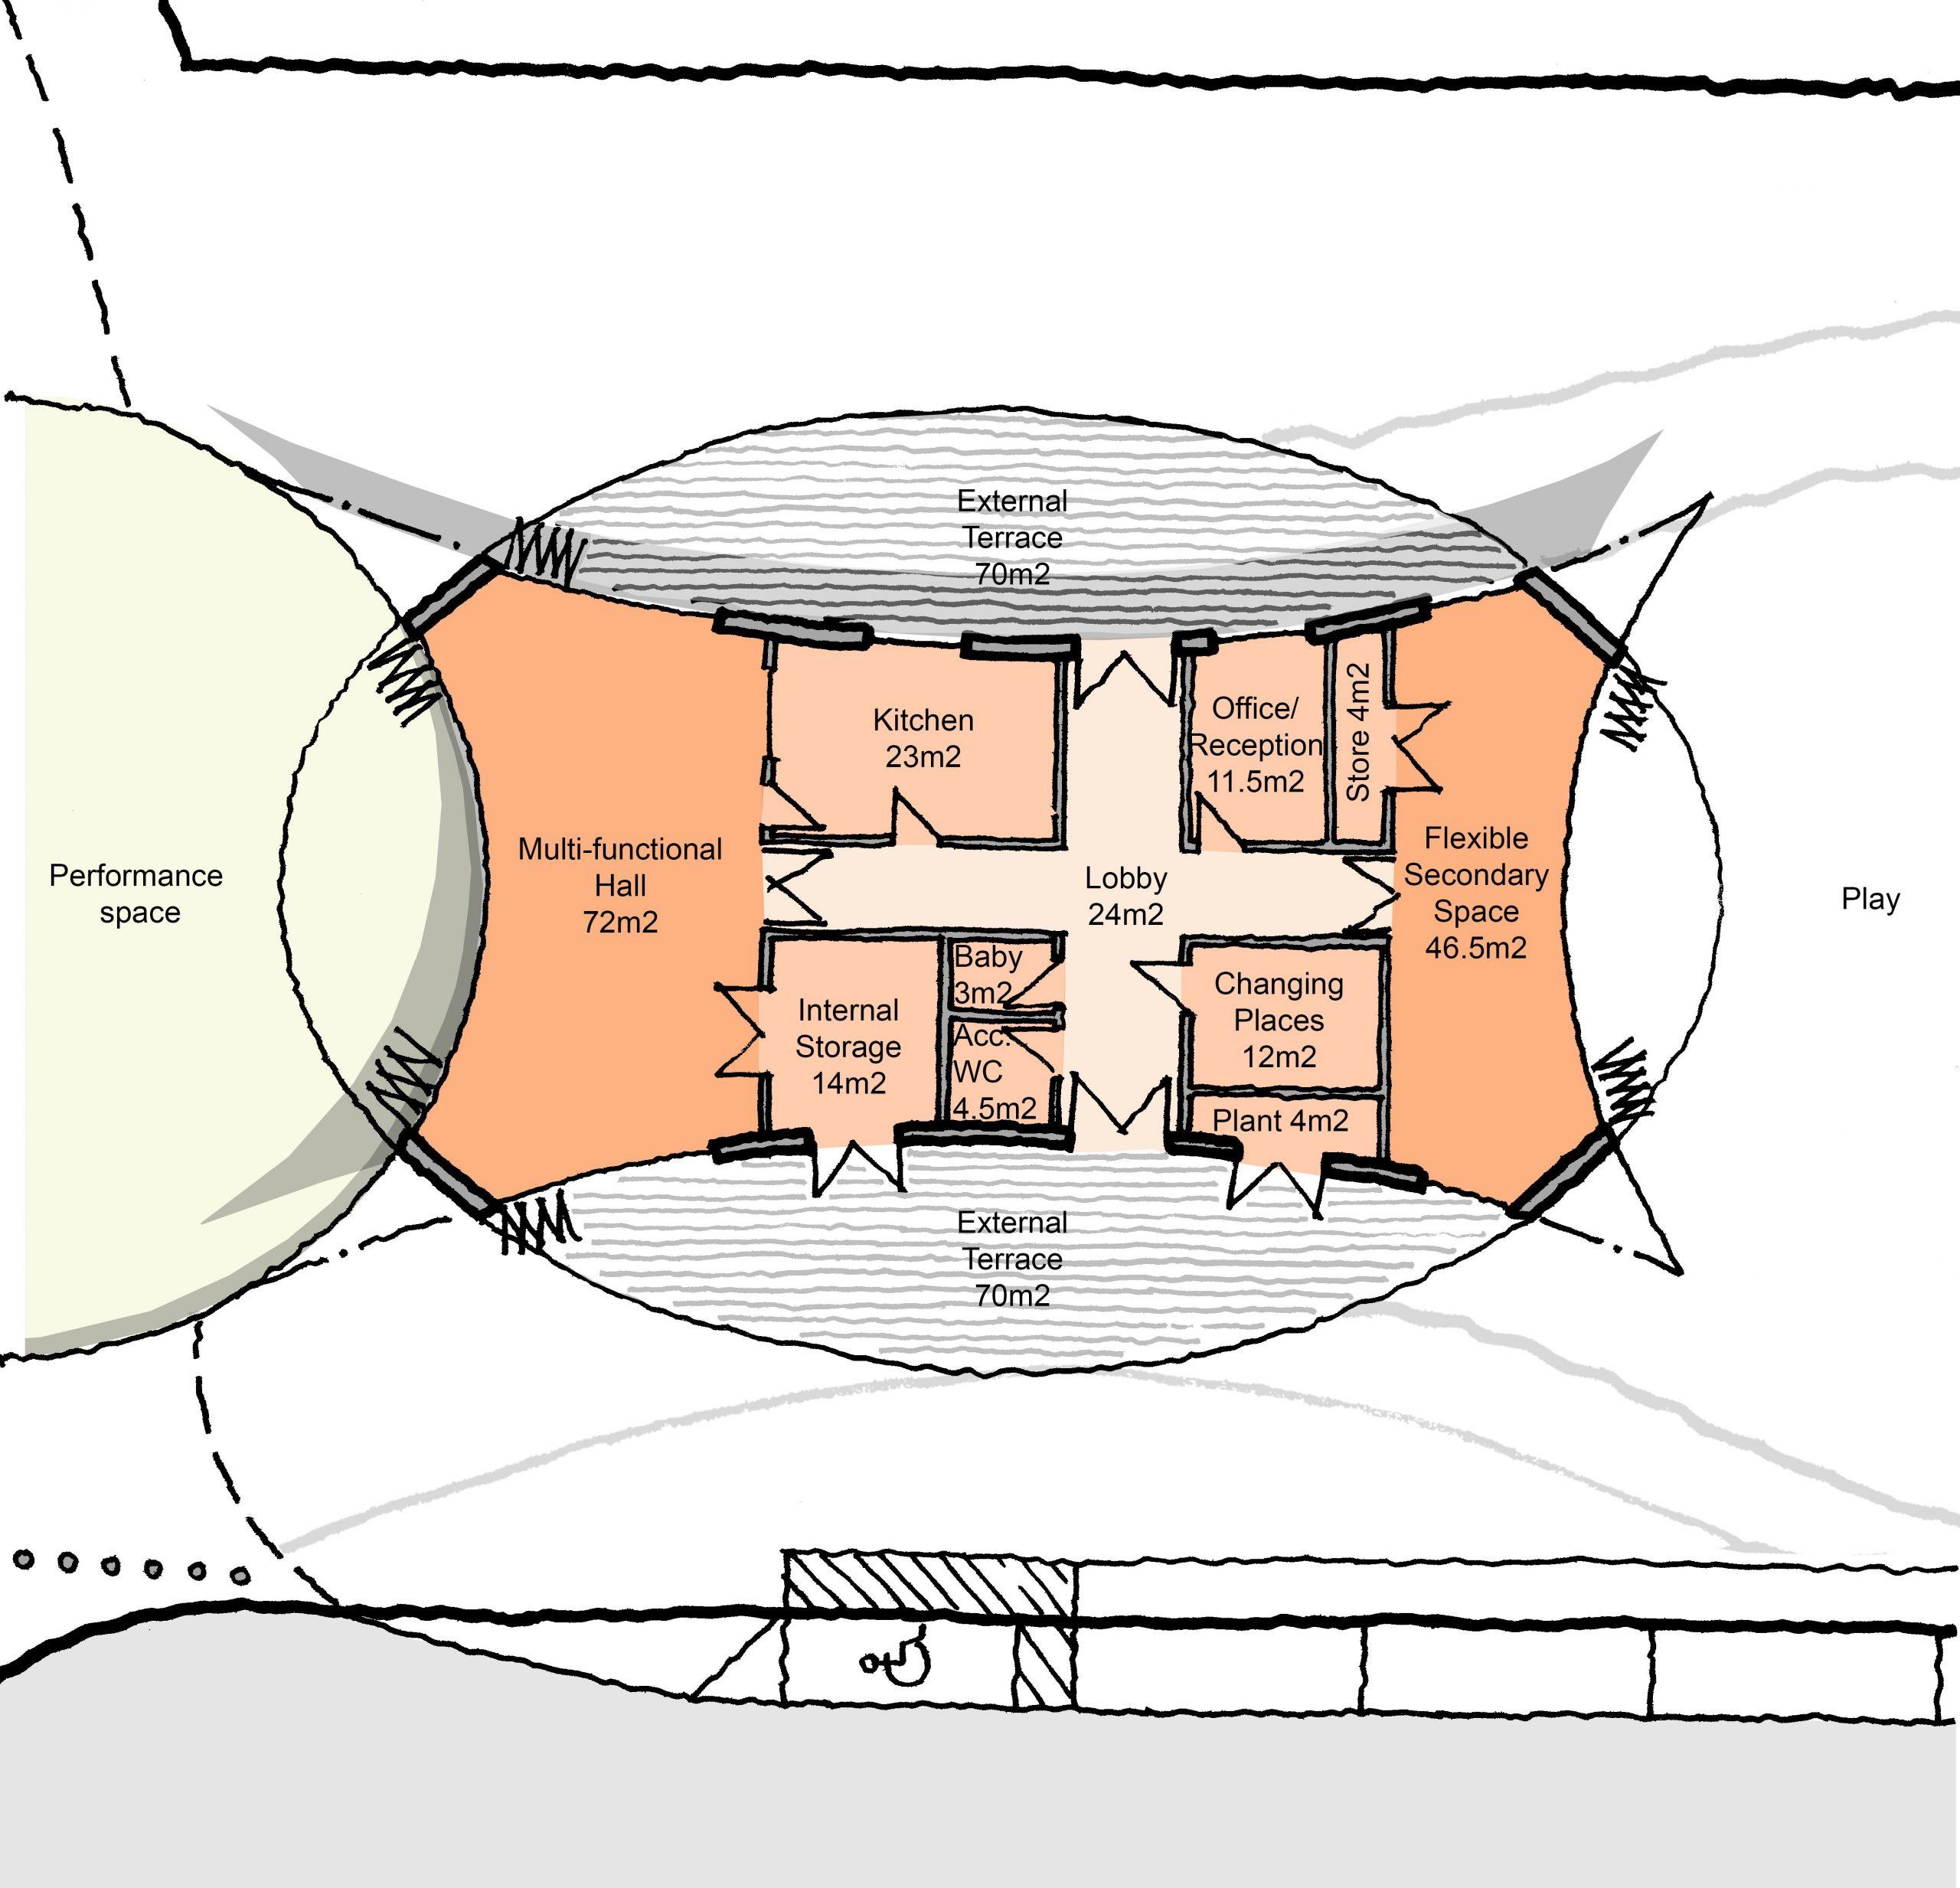 Site A - Scheme 3 - Proposed Plan